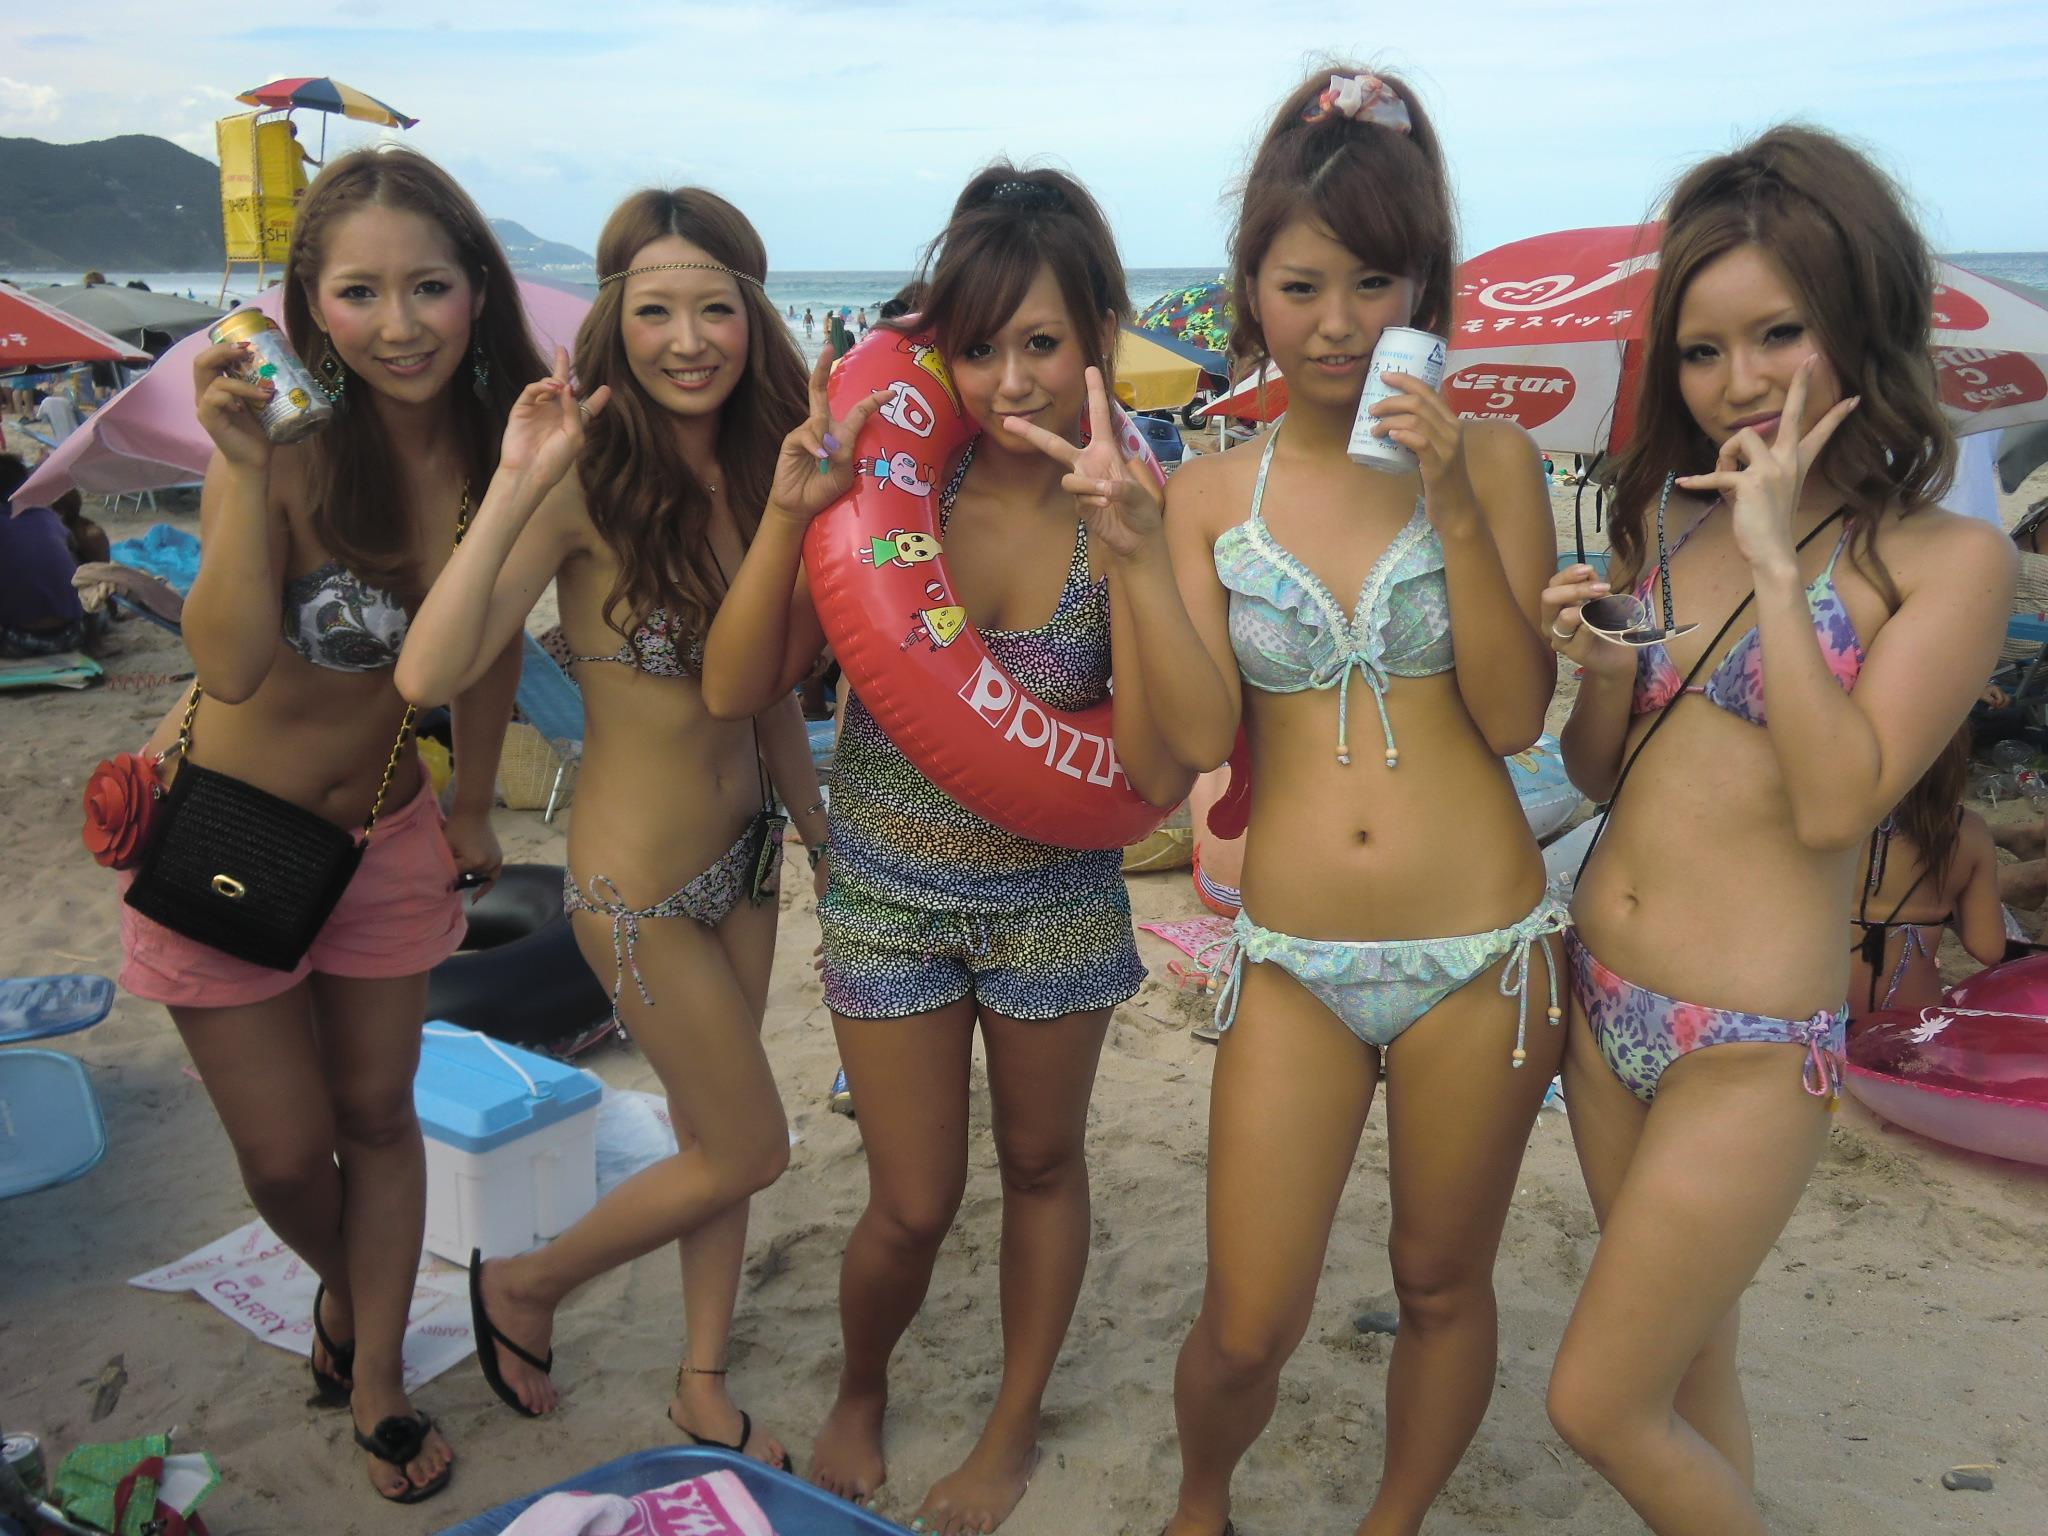 swimsuit_3660_041